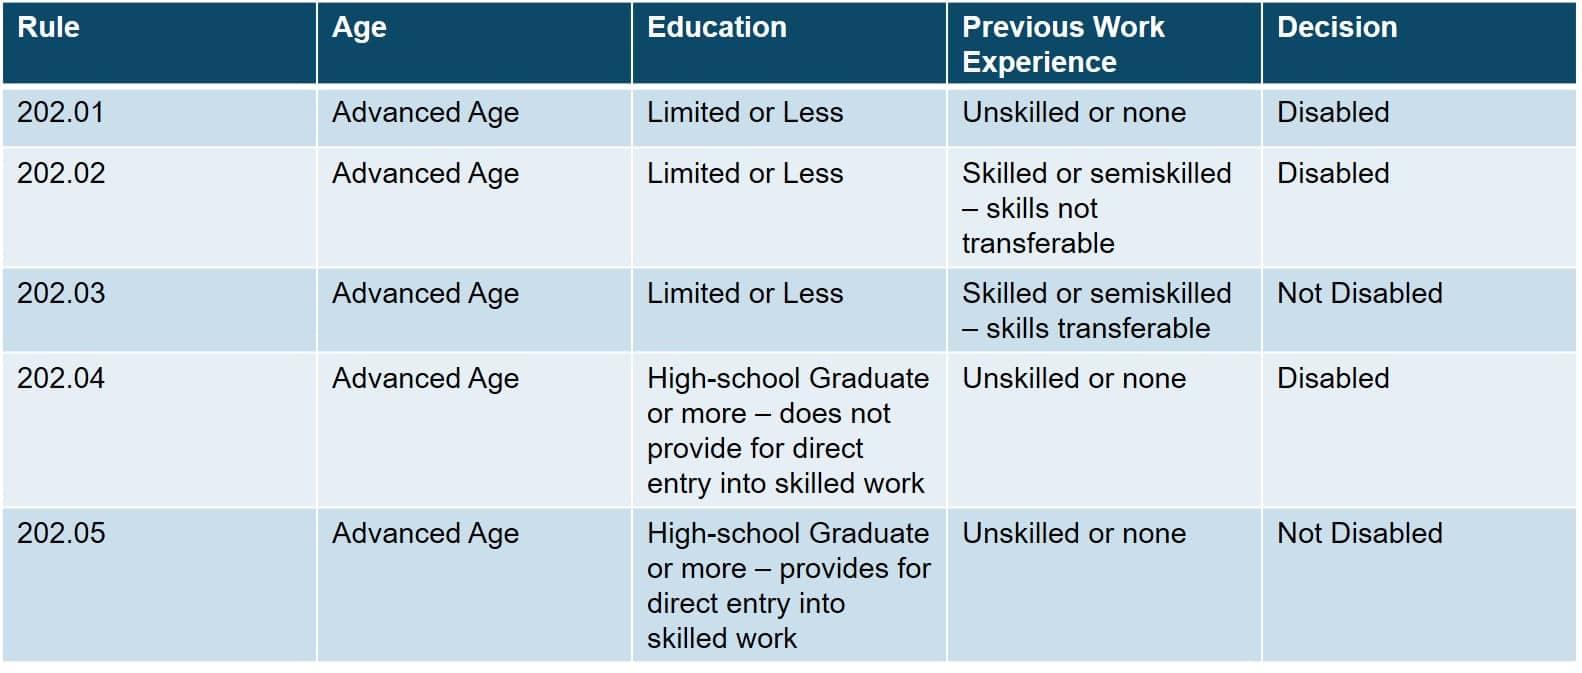 Skilled Worker | Transferability of Skills | LaBovick Law Group& Diaz